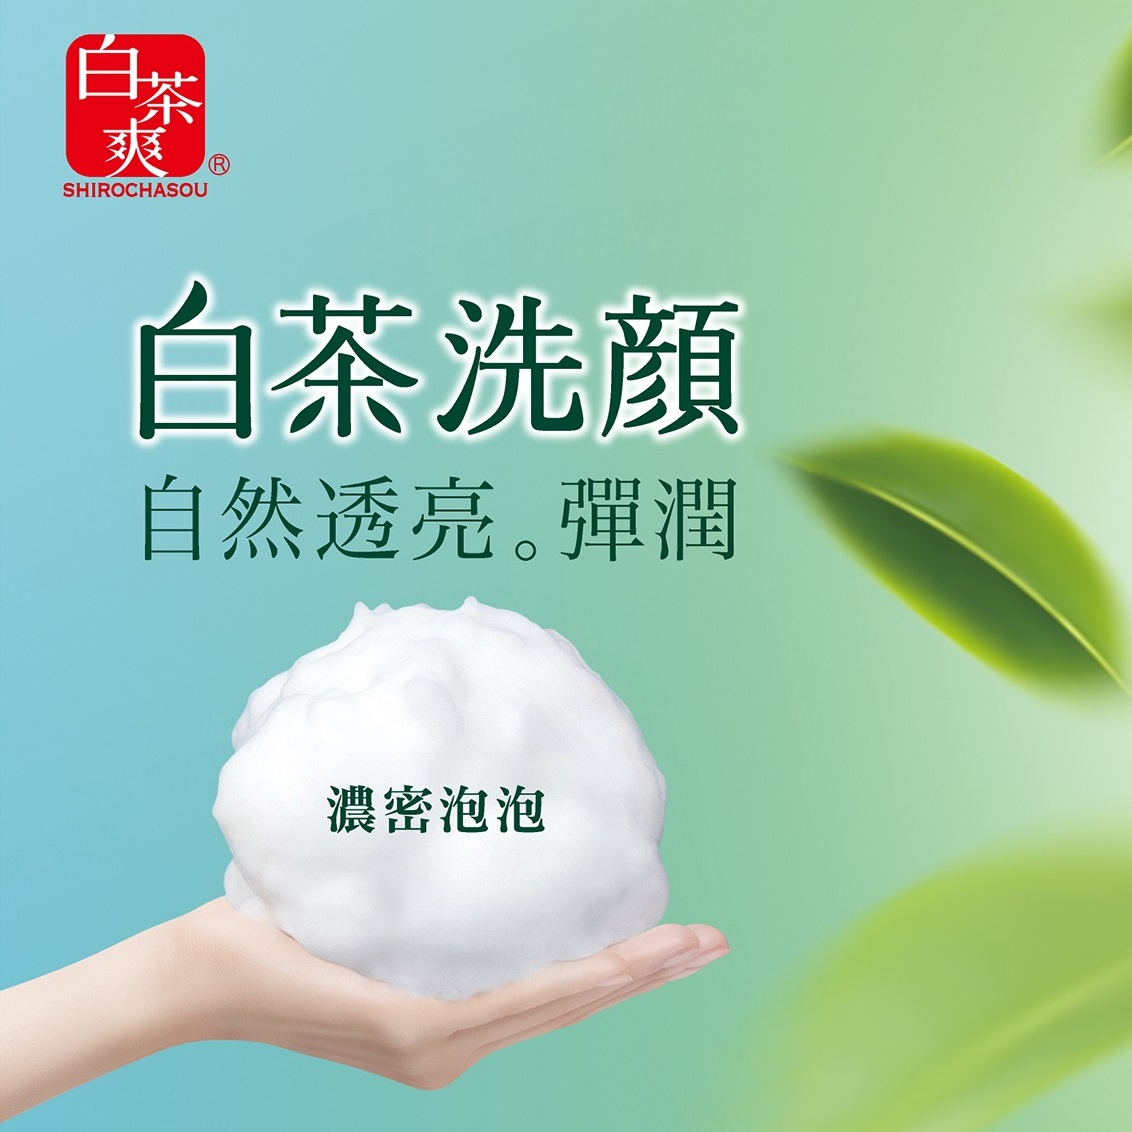 Sữa Rửa Mặt Trà Trắng Shirochasou White Tea Face Wash (120g)